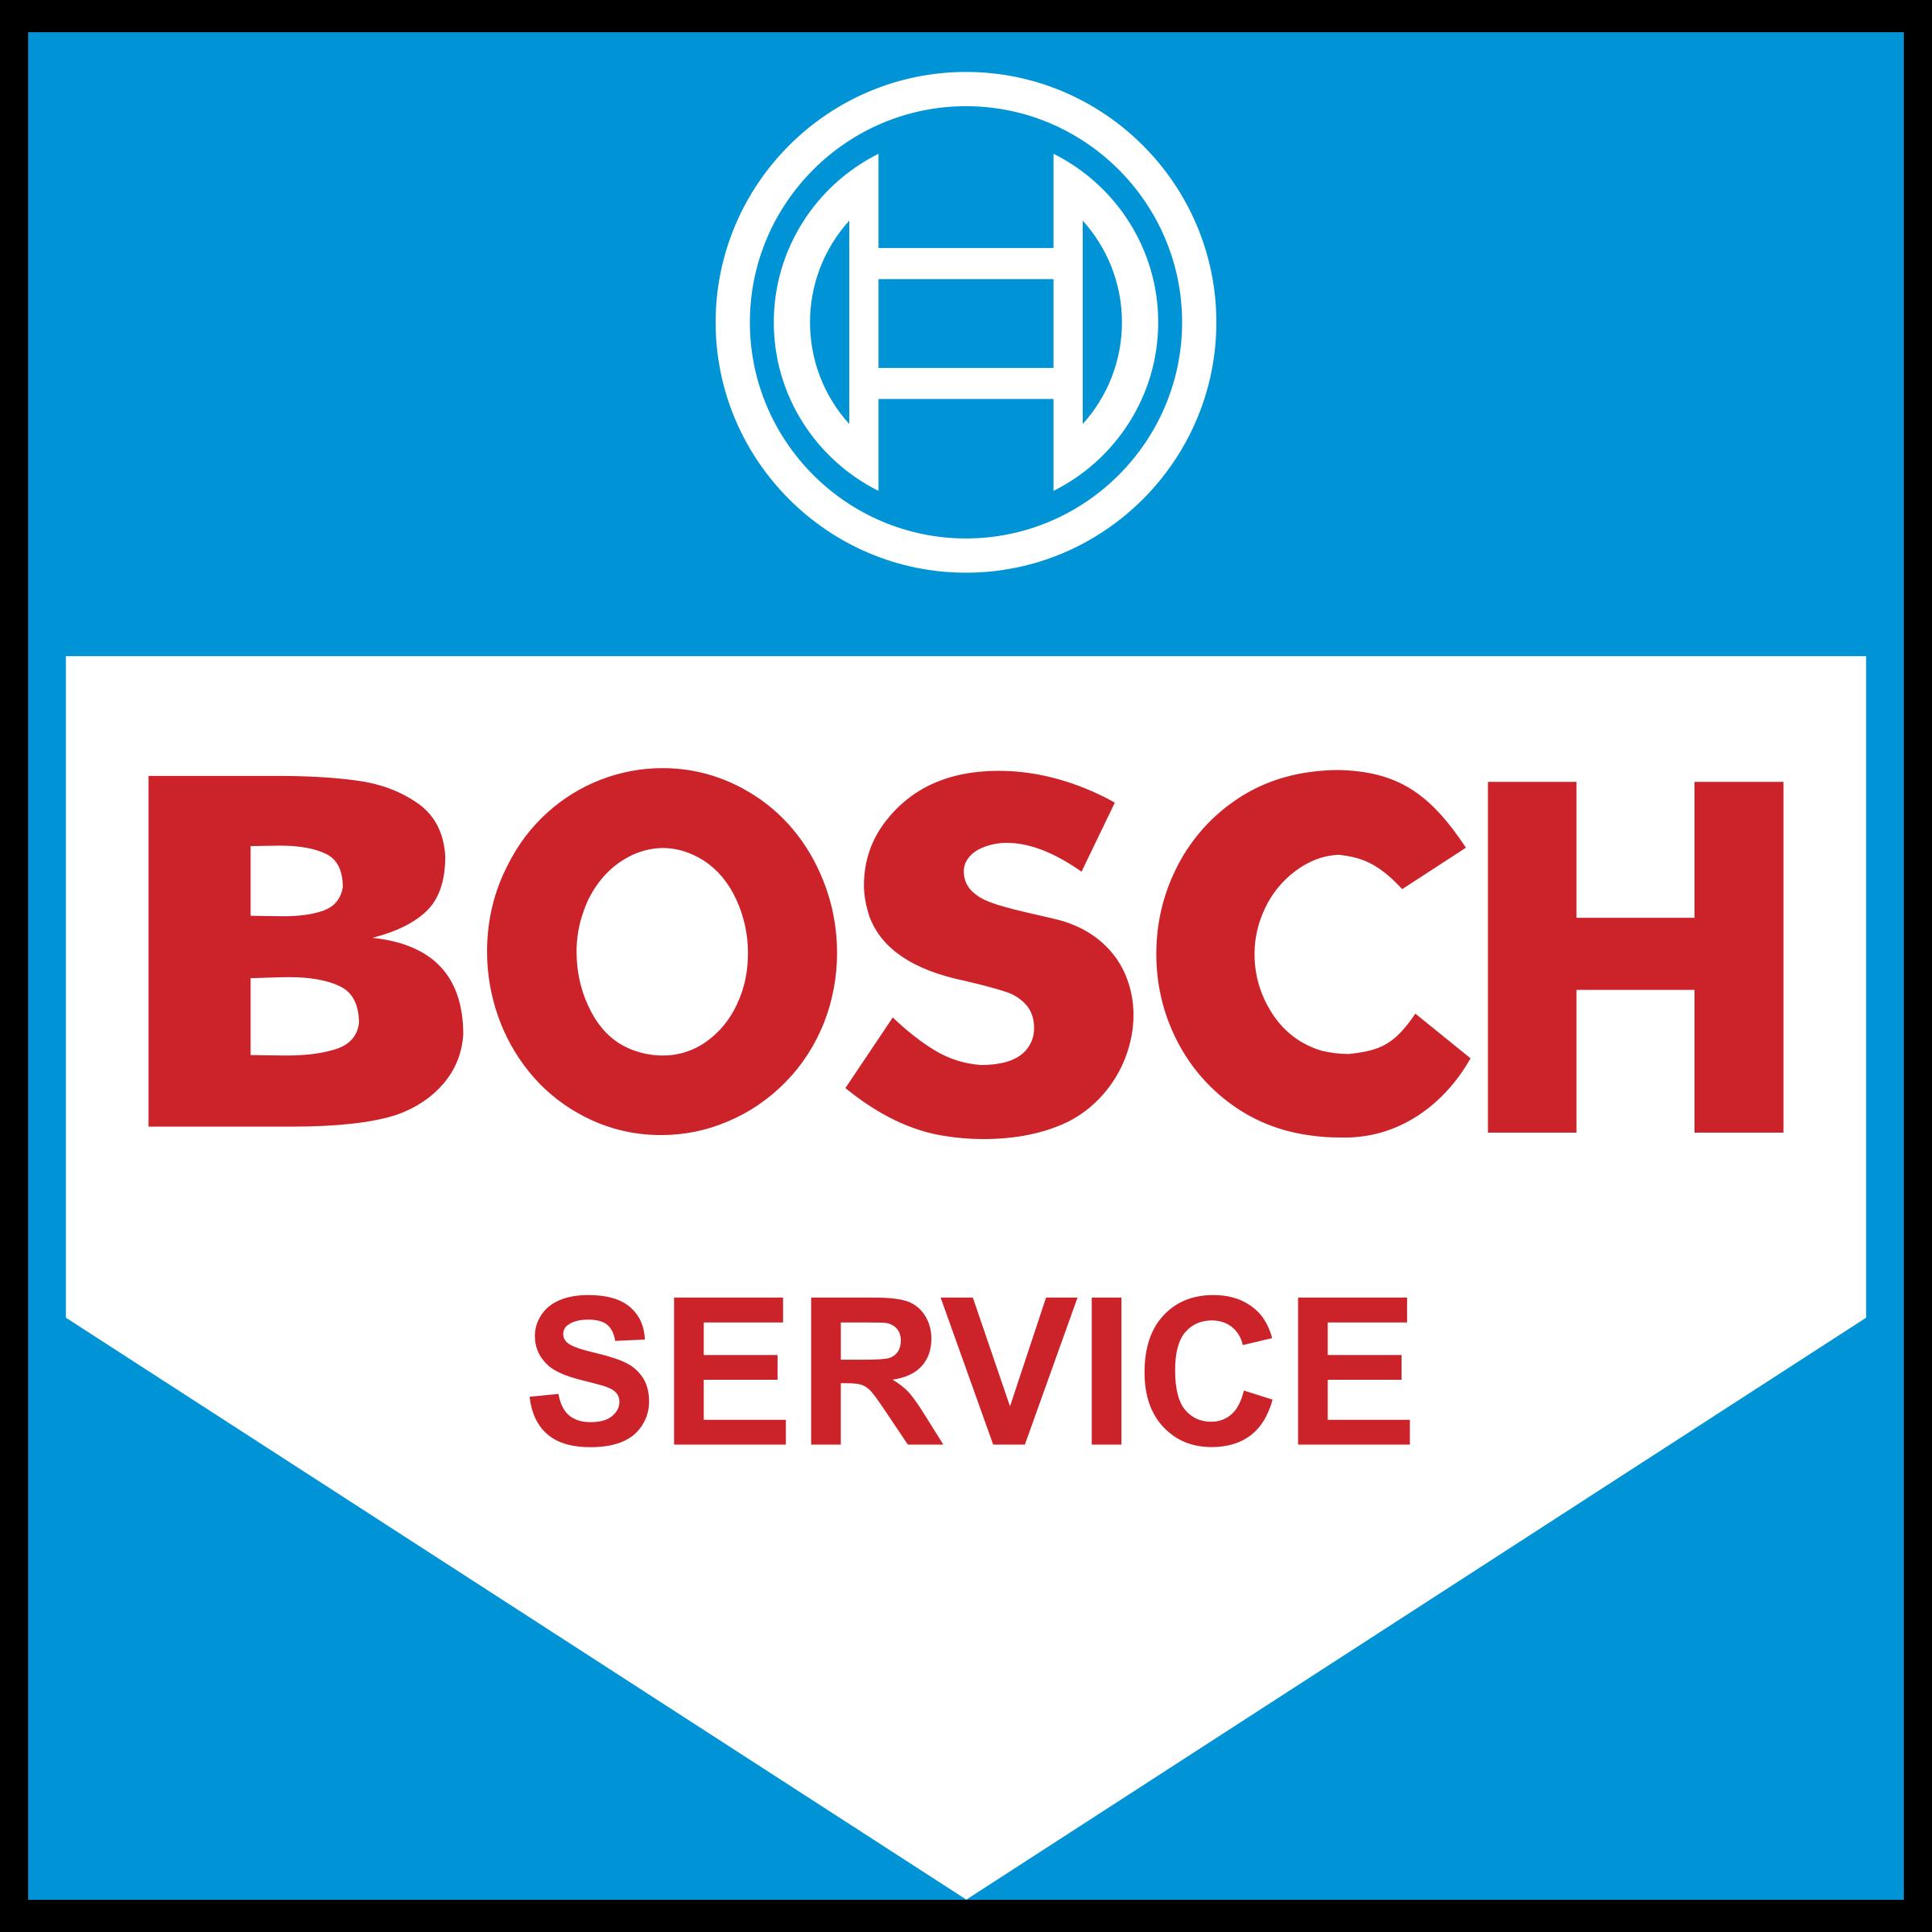 Bosch Service Logo PNG Transparent & SVG Vector.